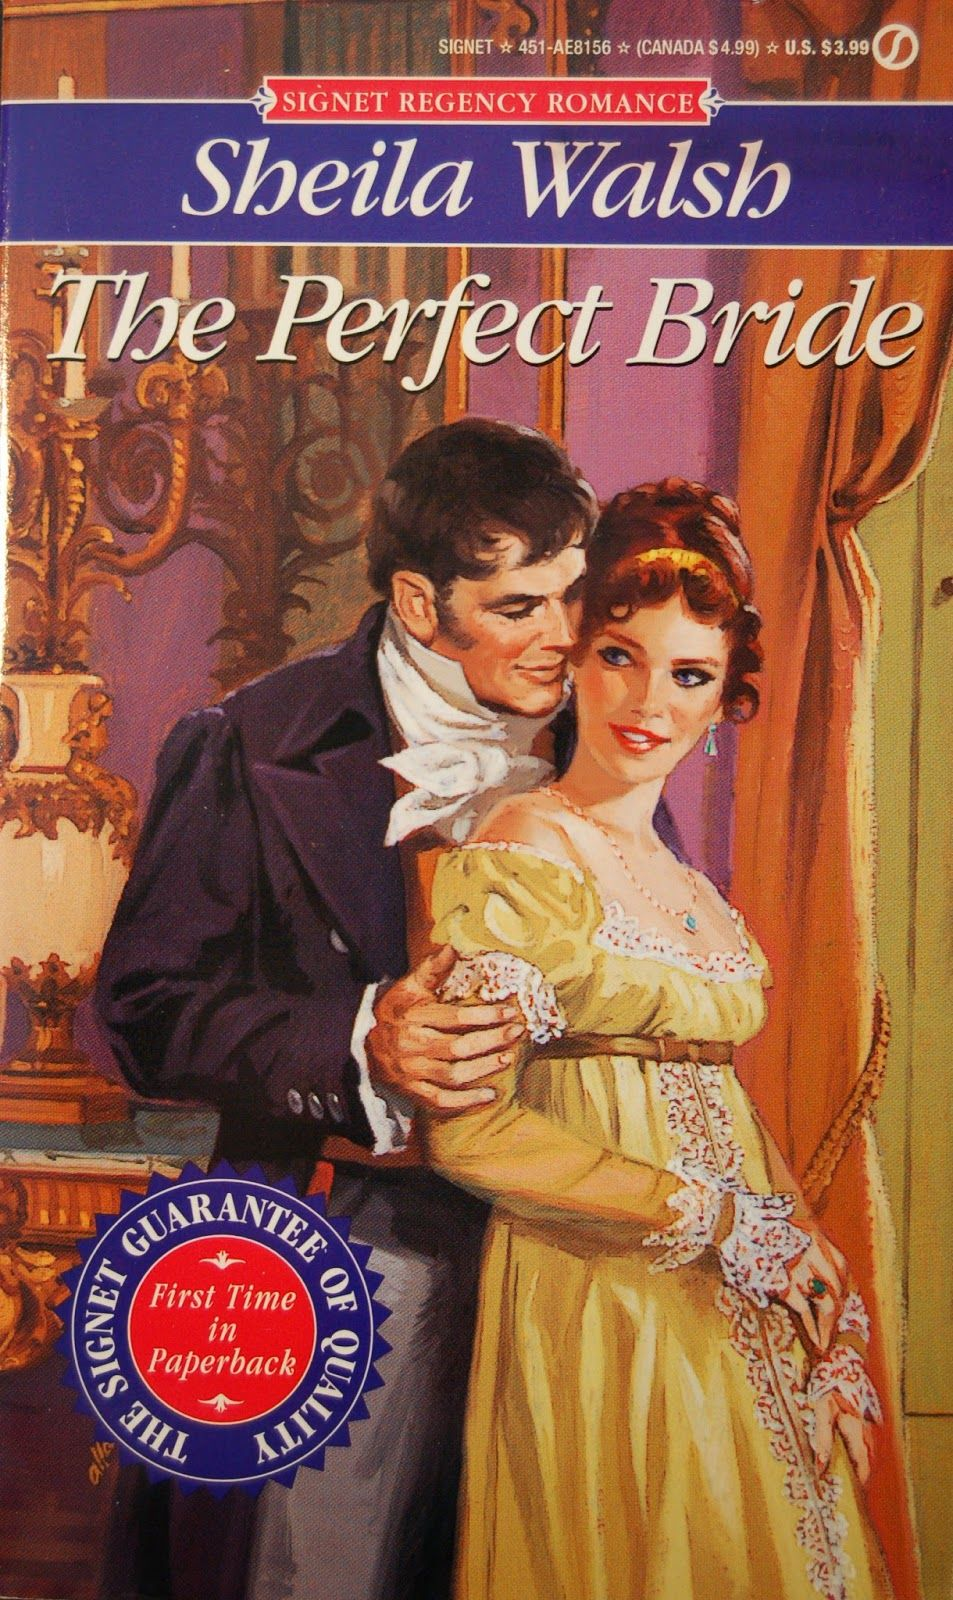 The Perfect Bride (Signet Regency Romance)